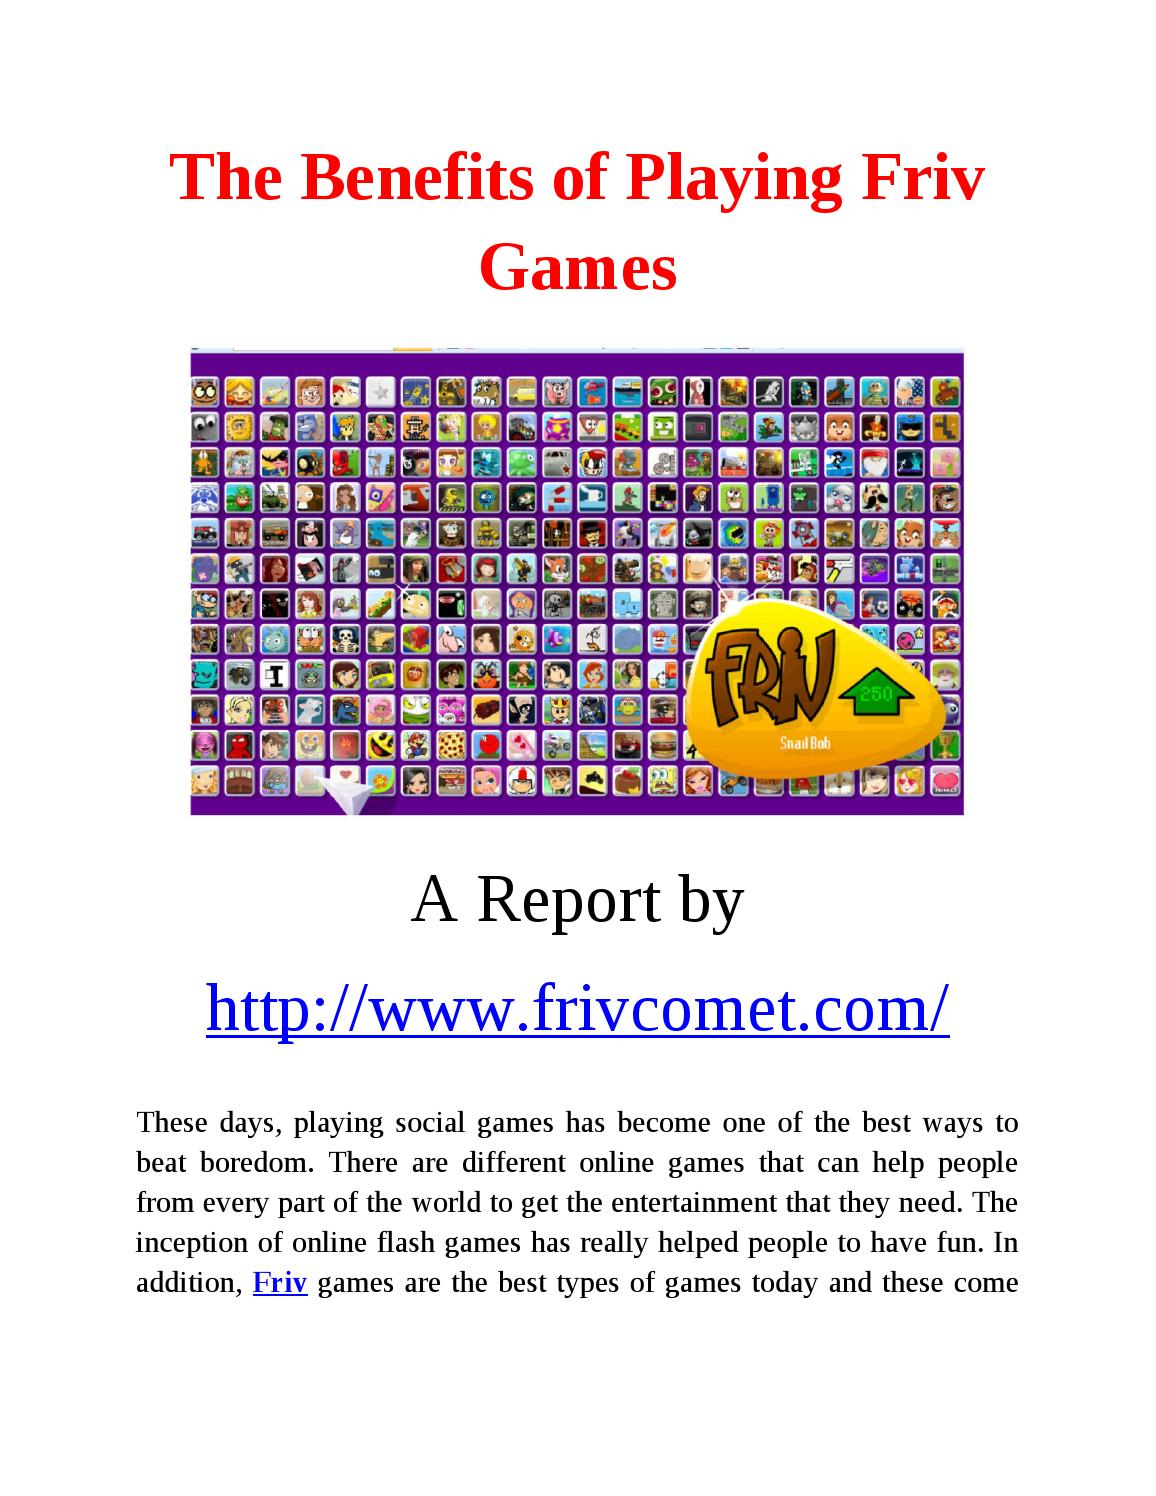 Friv play games online by syed muntajib - issuu